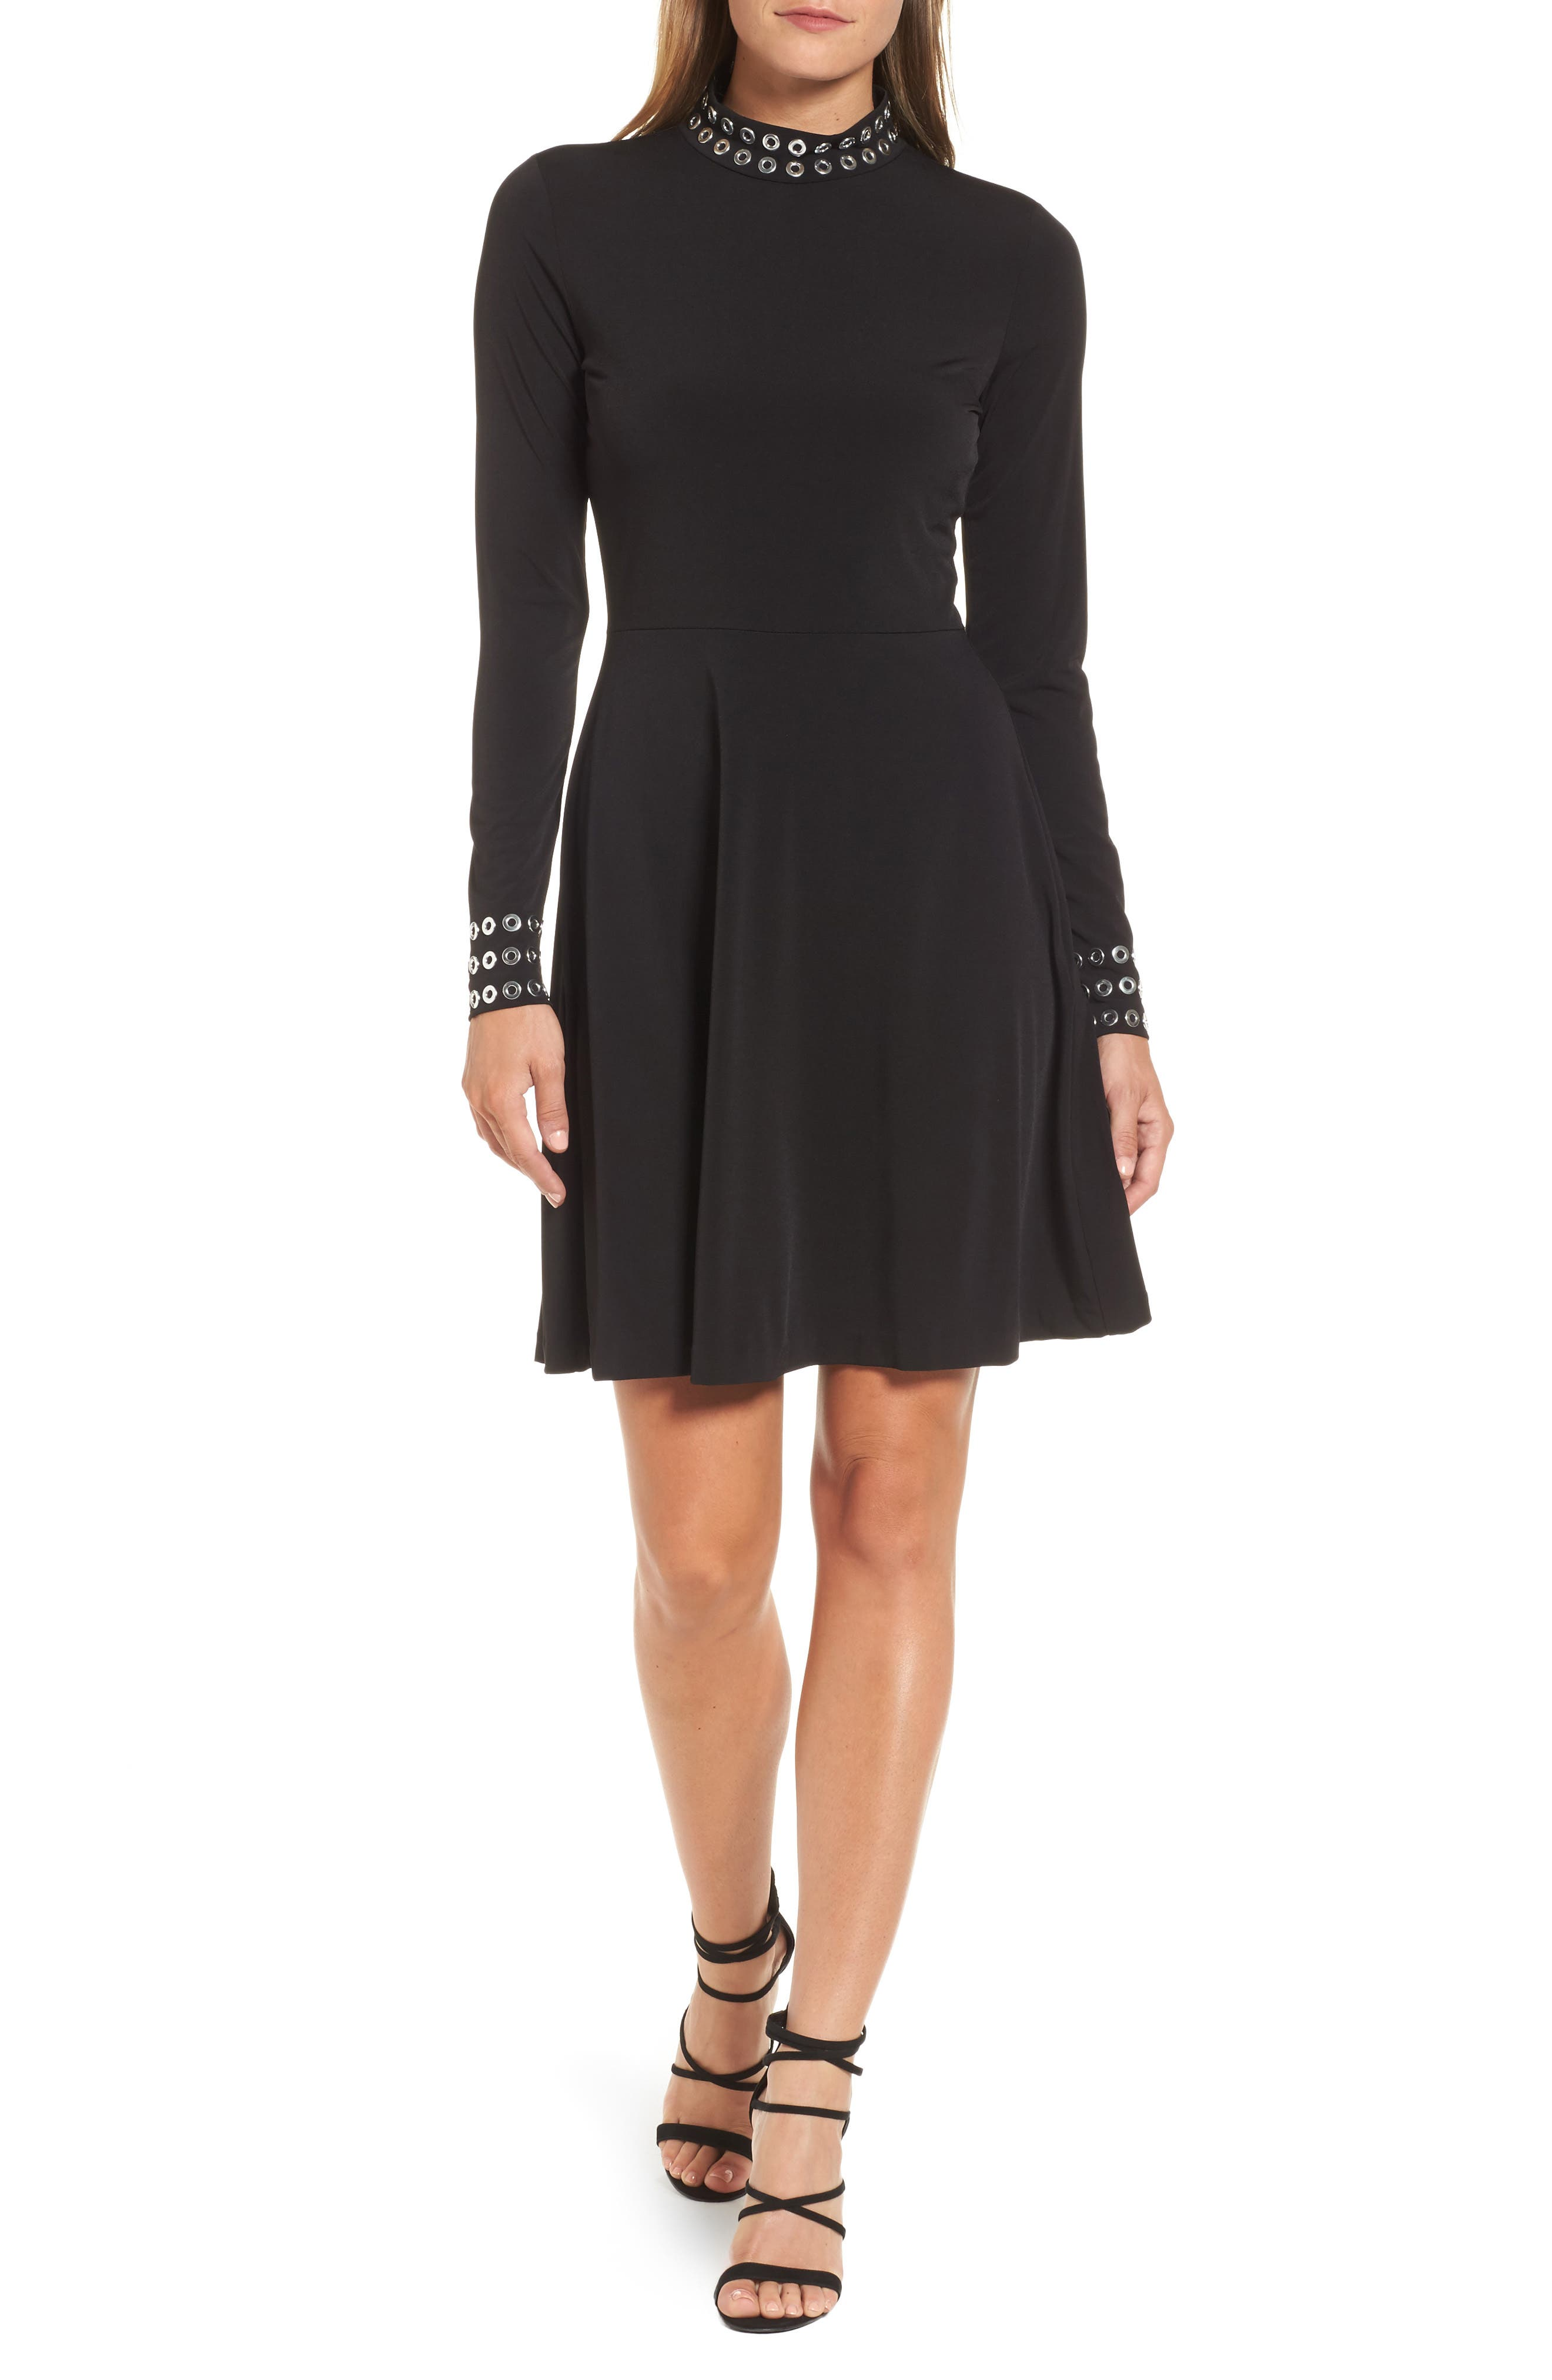 Grommet Mock Neck Knit Dress,                             Main thumbnail 1, color,                             Black